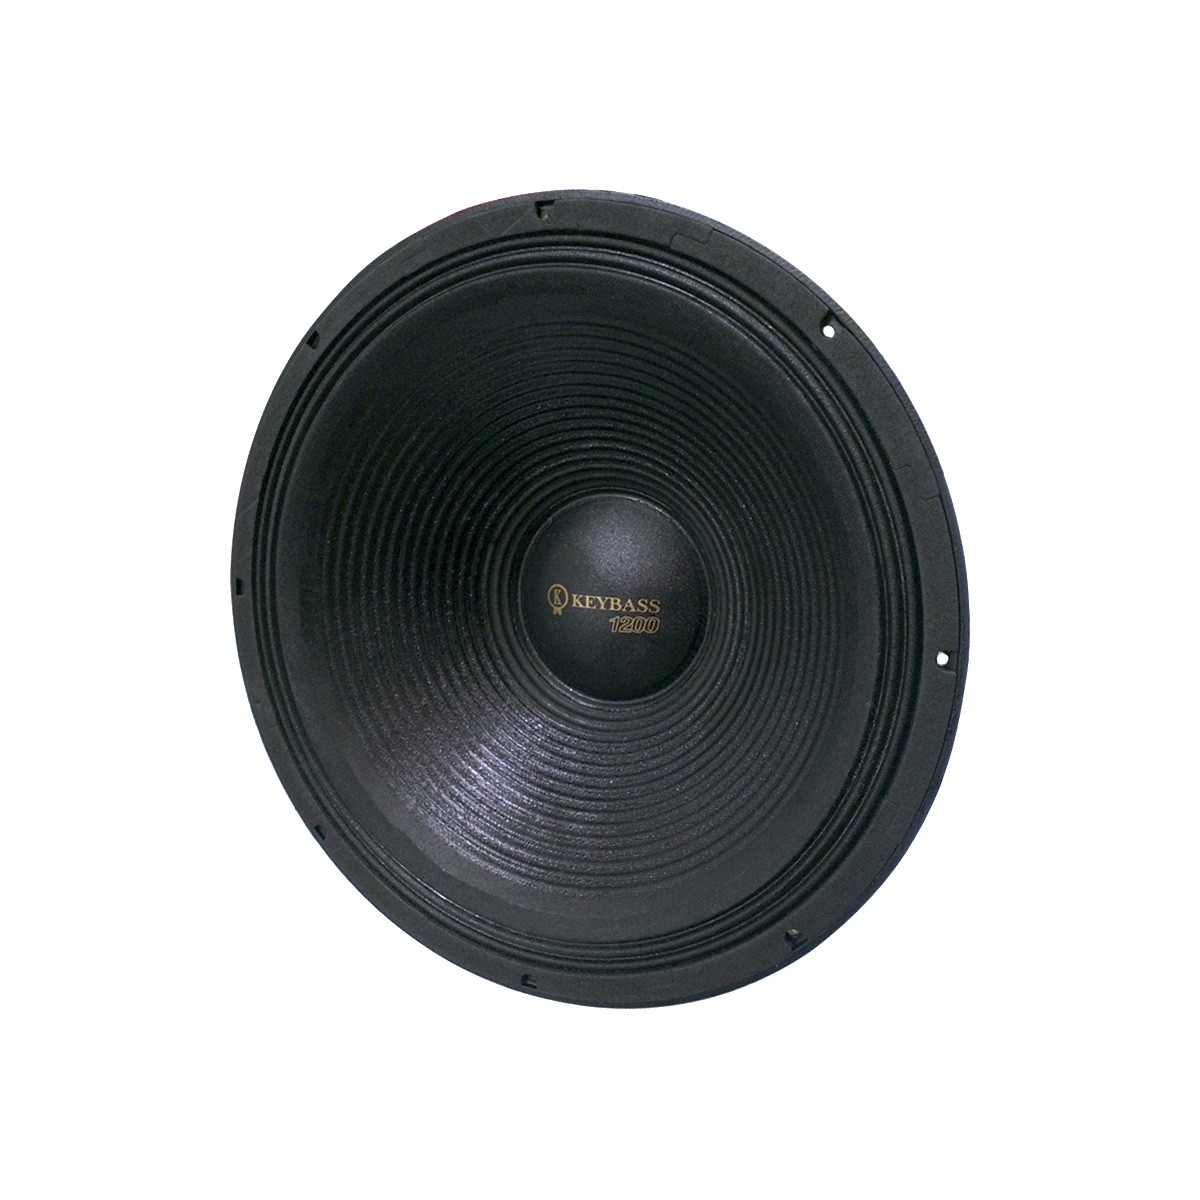 Alto-falante Subwoofer 8 ohms 1200W RMS Keybass KSPA181200